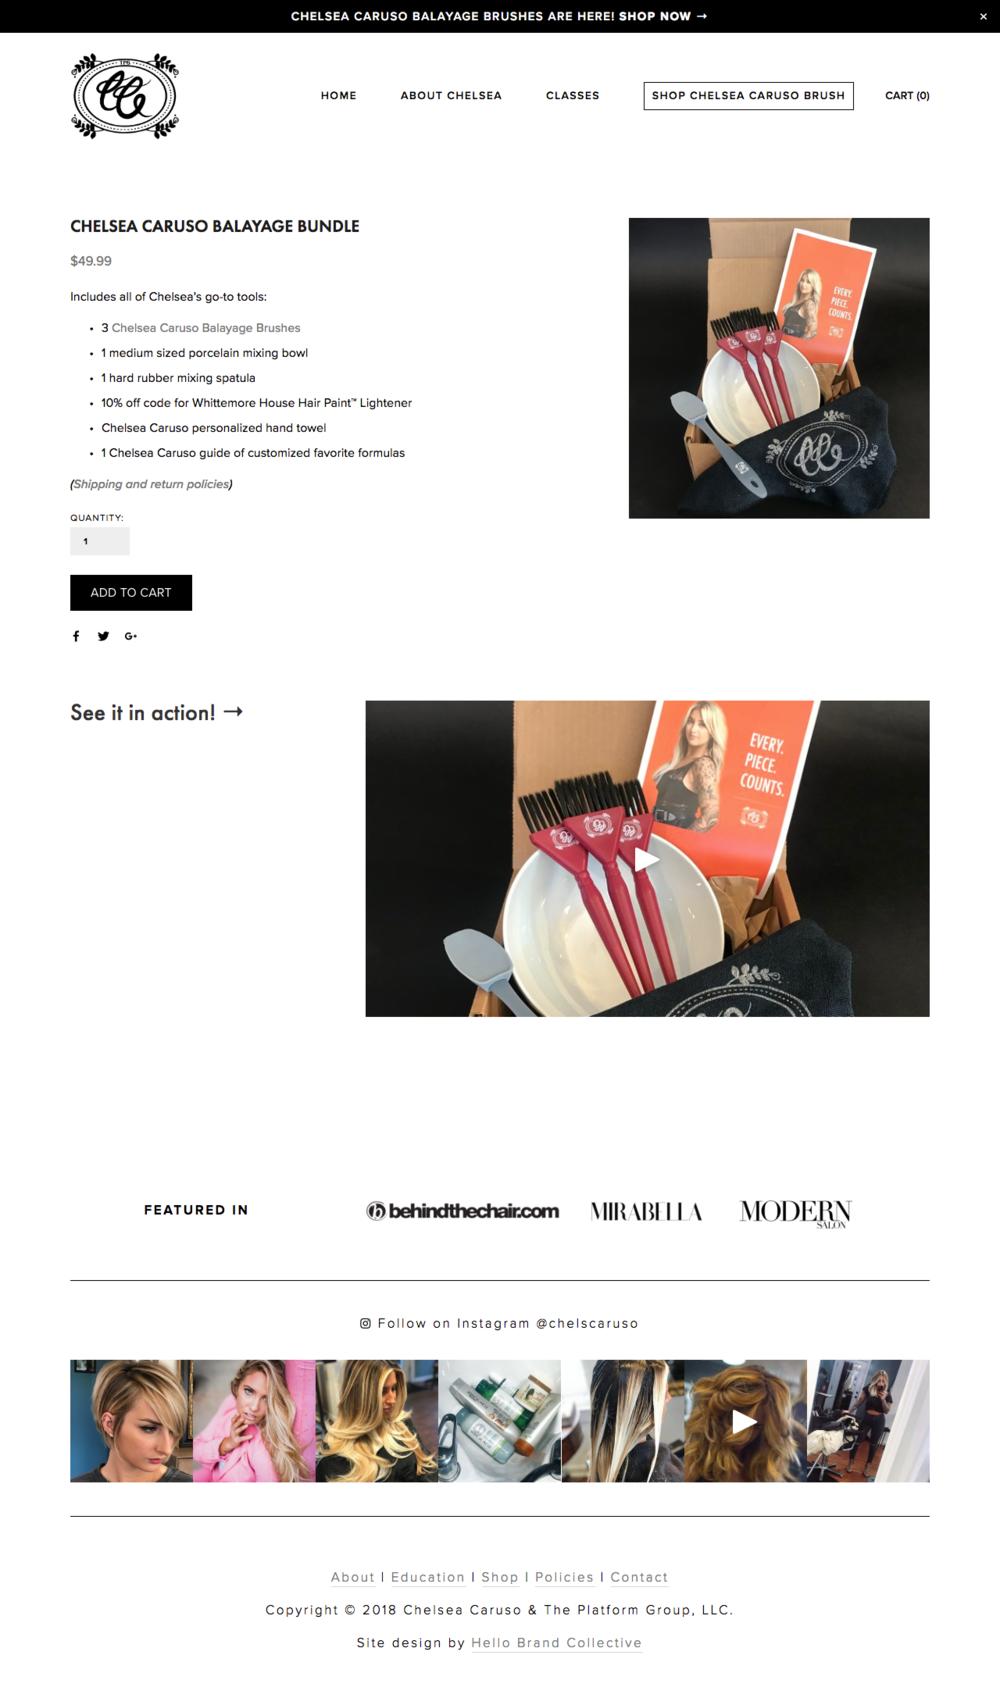 screencapture-chelseacaruso-squarespace-shop-balayage-bundle-2018-11-24-01_42_30.png